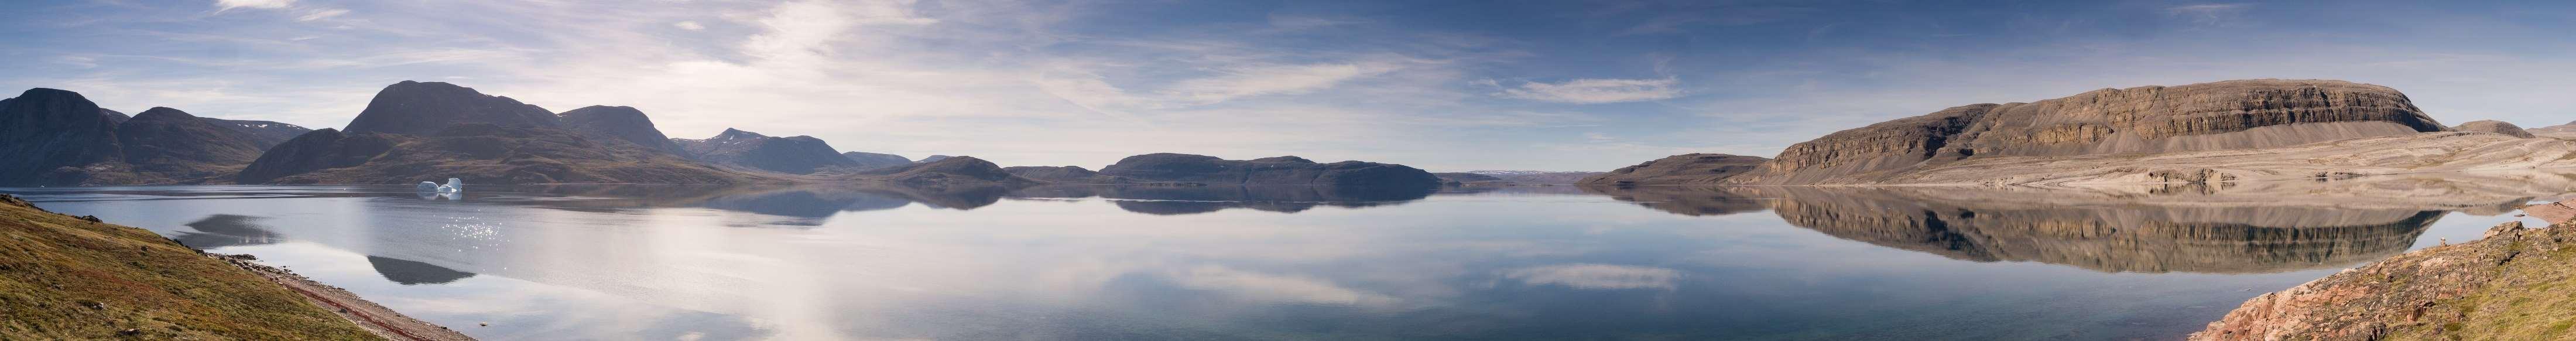 Baffin Island Photo 10